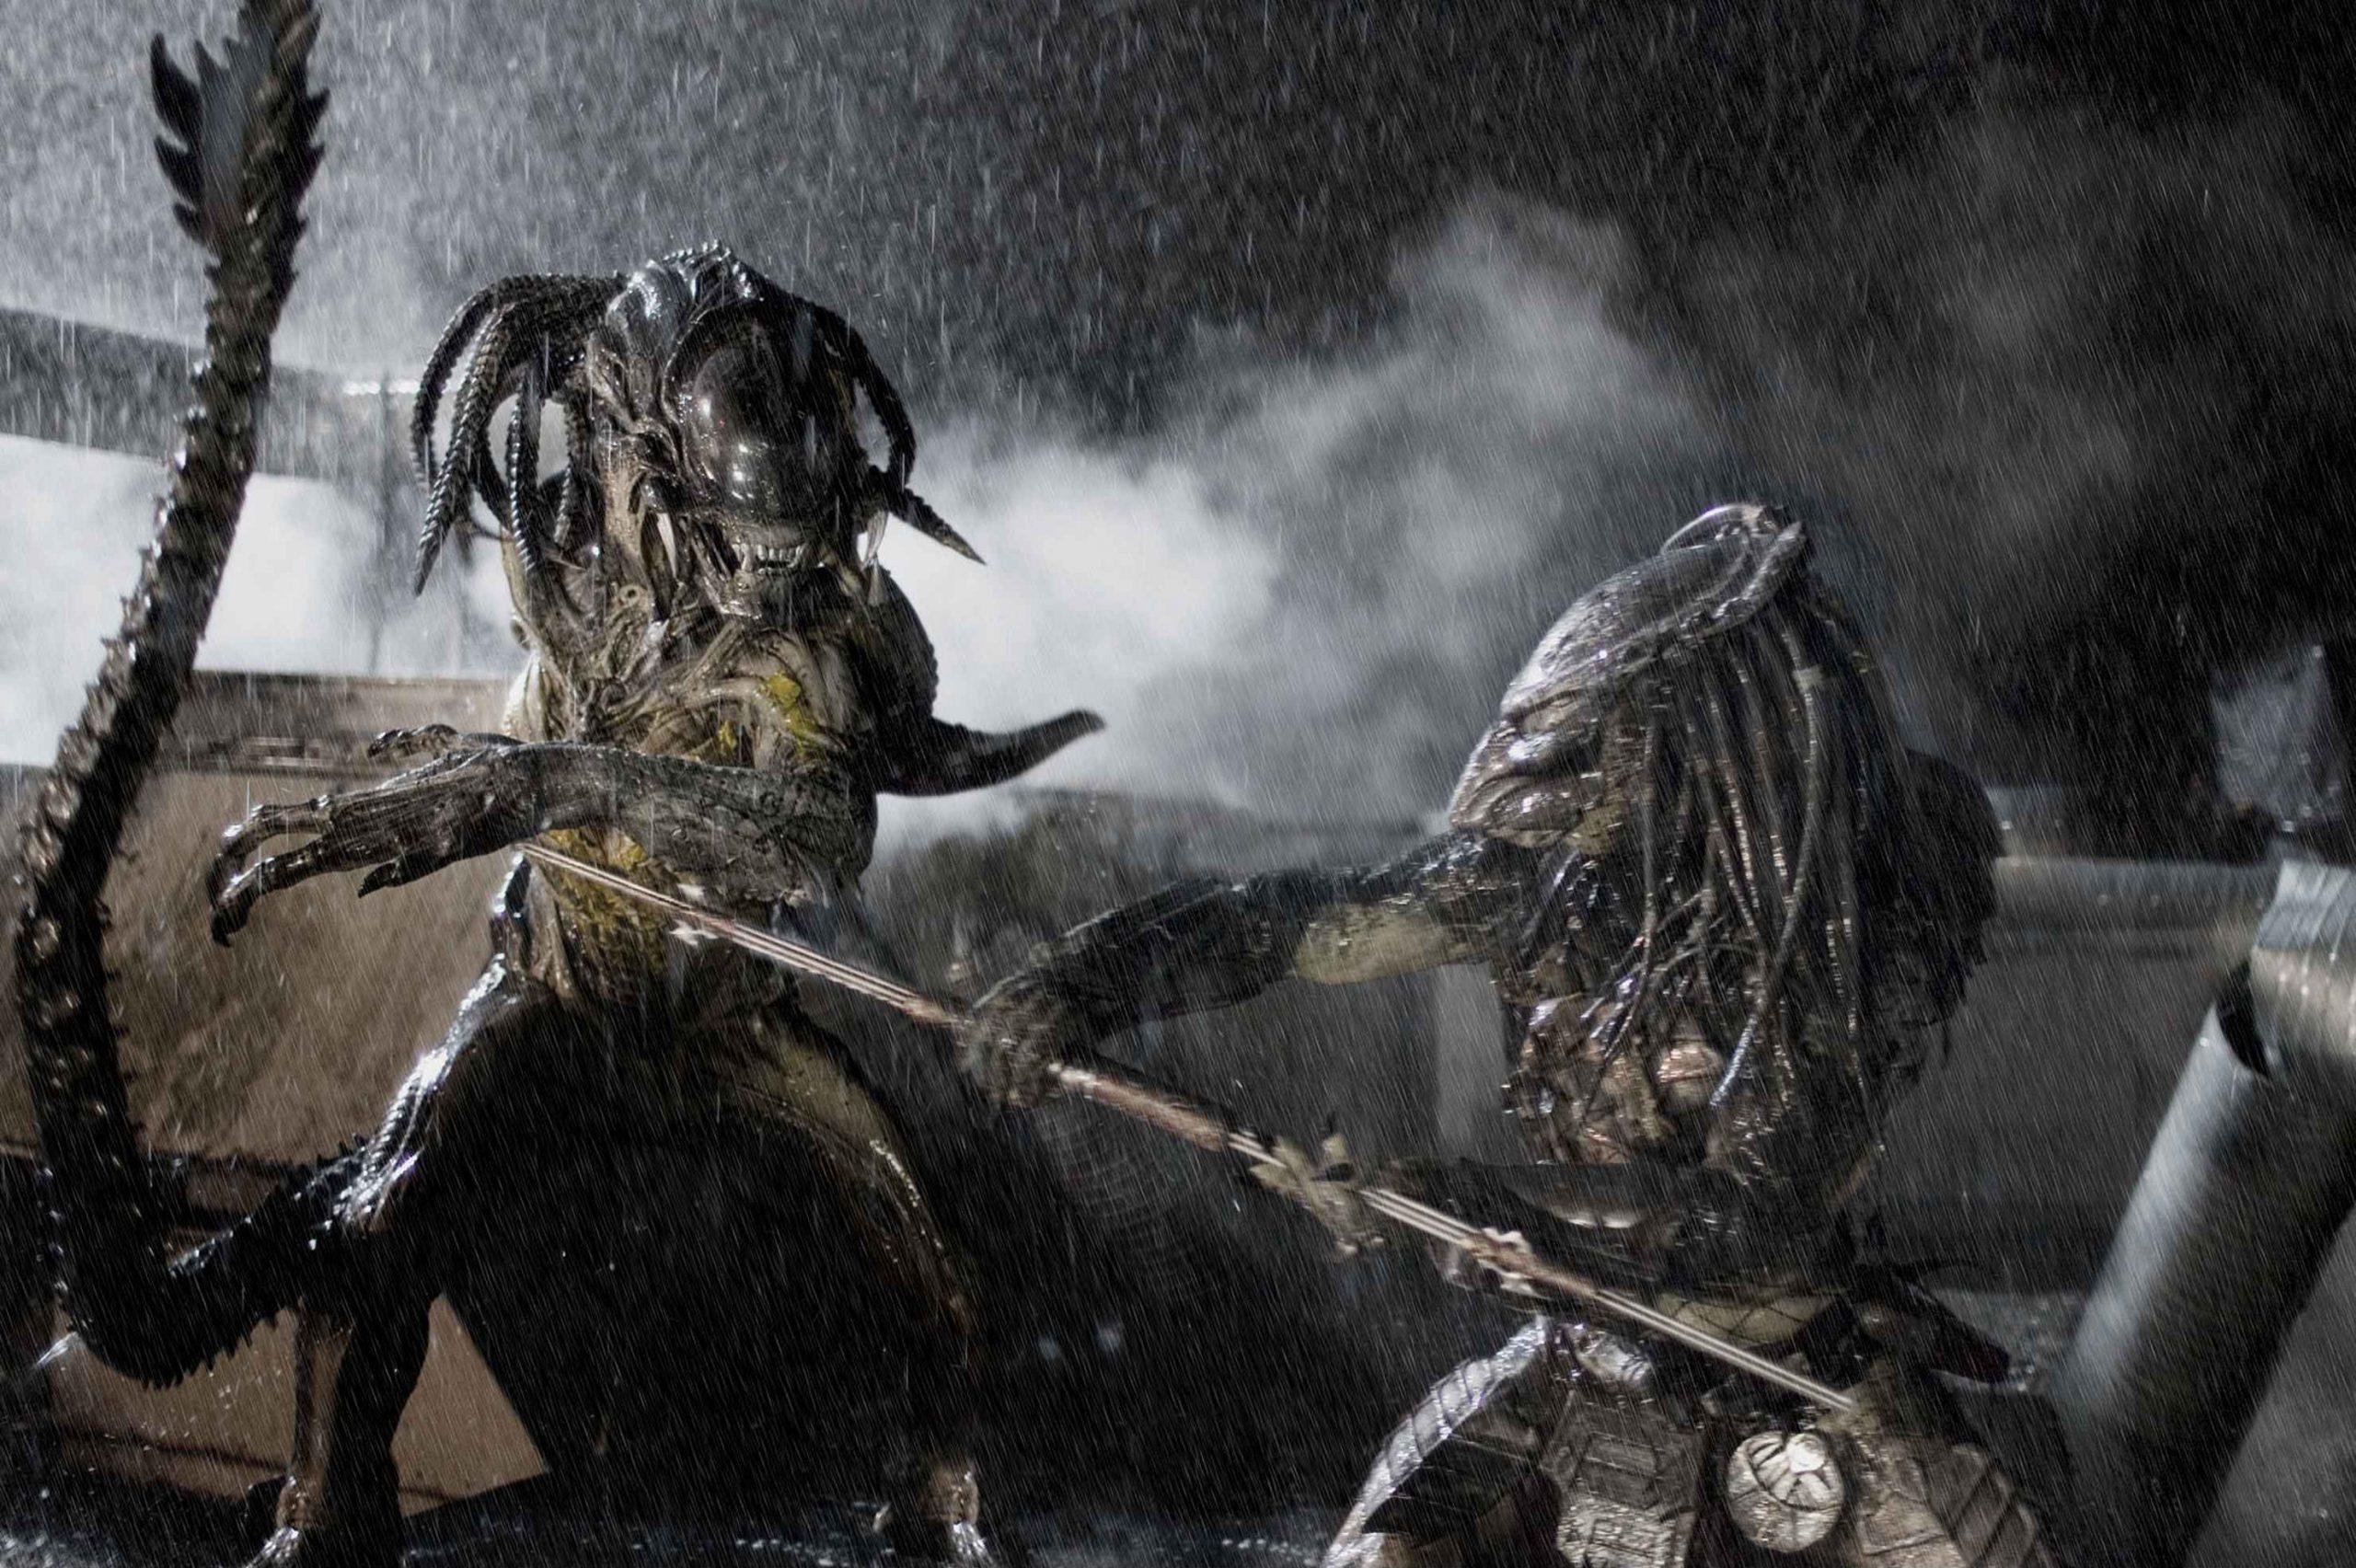 Alien Vs Predator Fan Edit Removes Humans Makes Movie Awesome Overmental